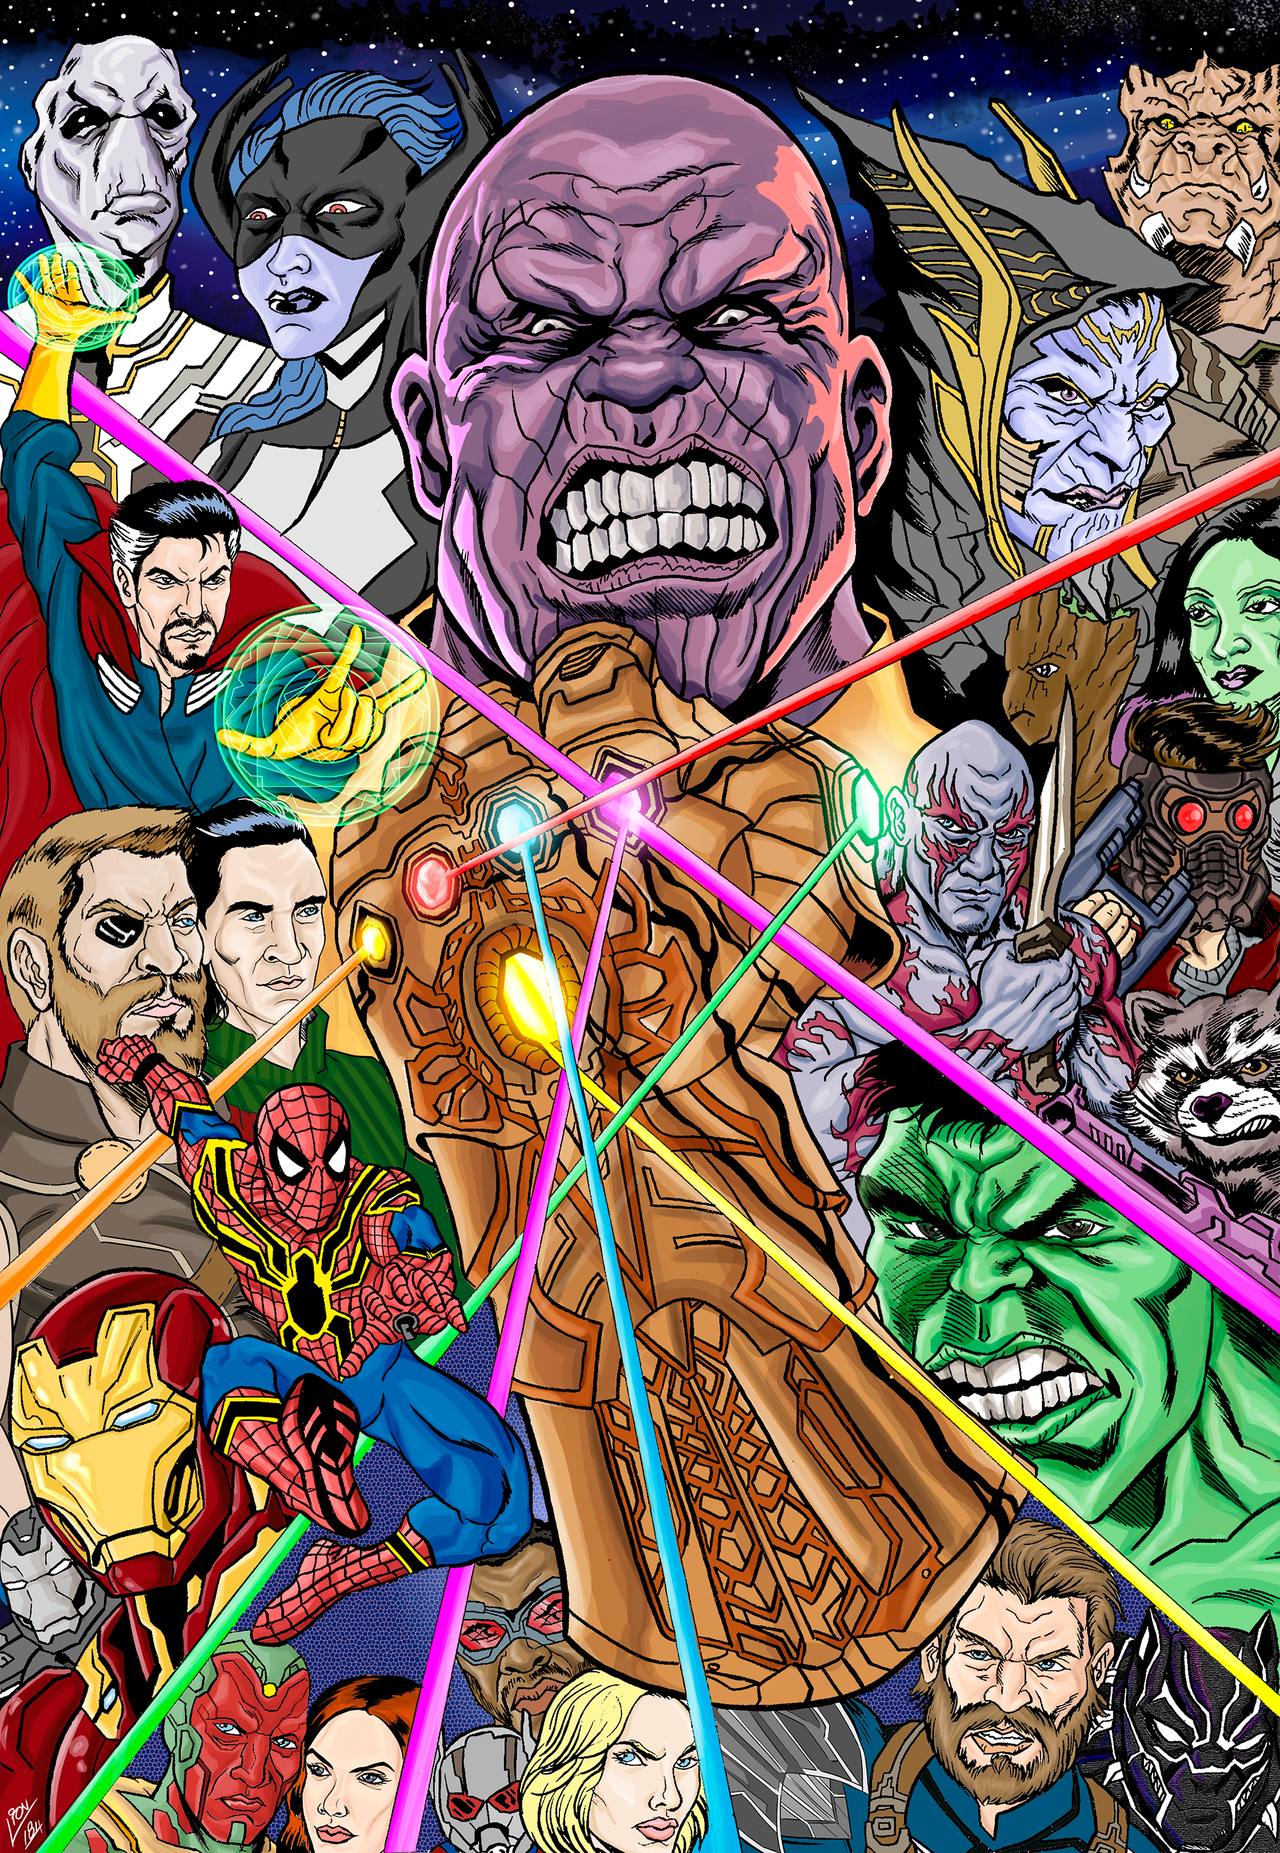 avengers - infinity war | leon sarmento - follow artist on behance